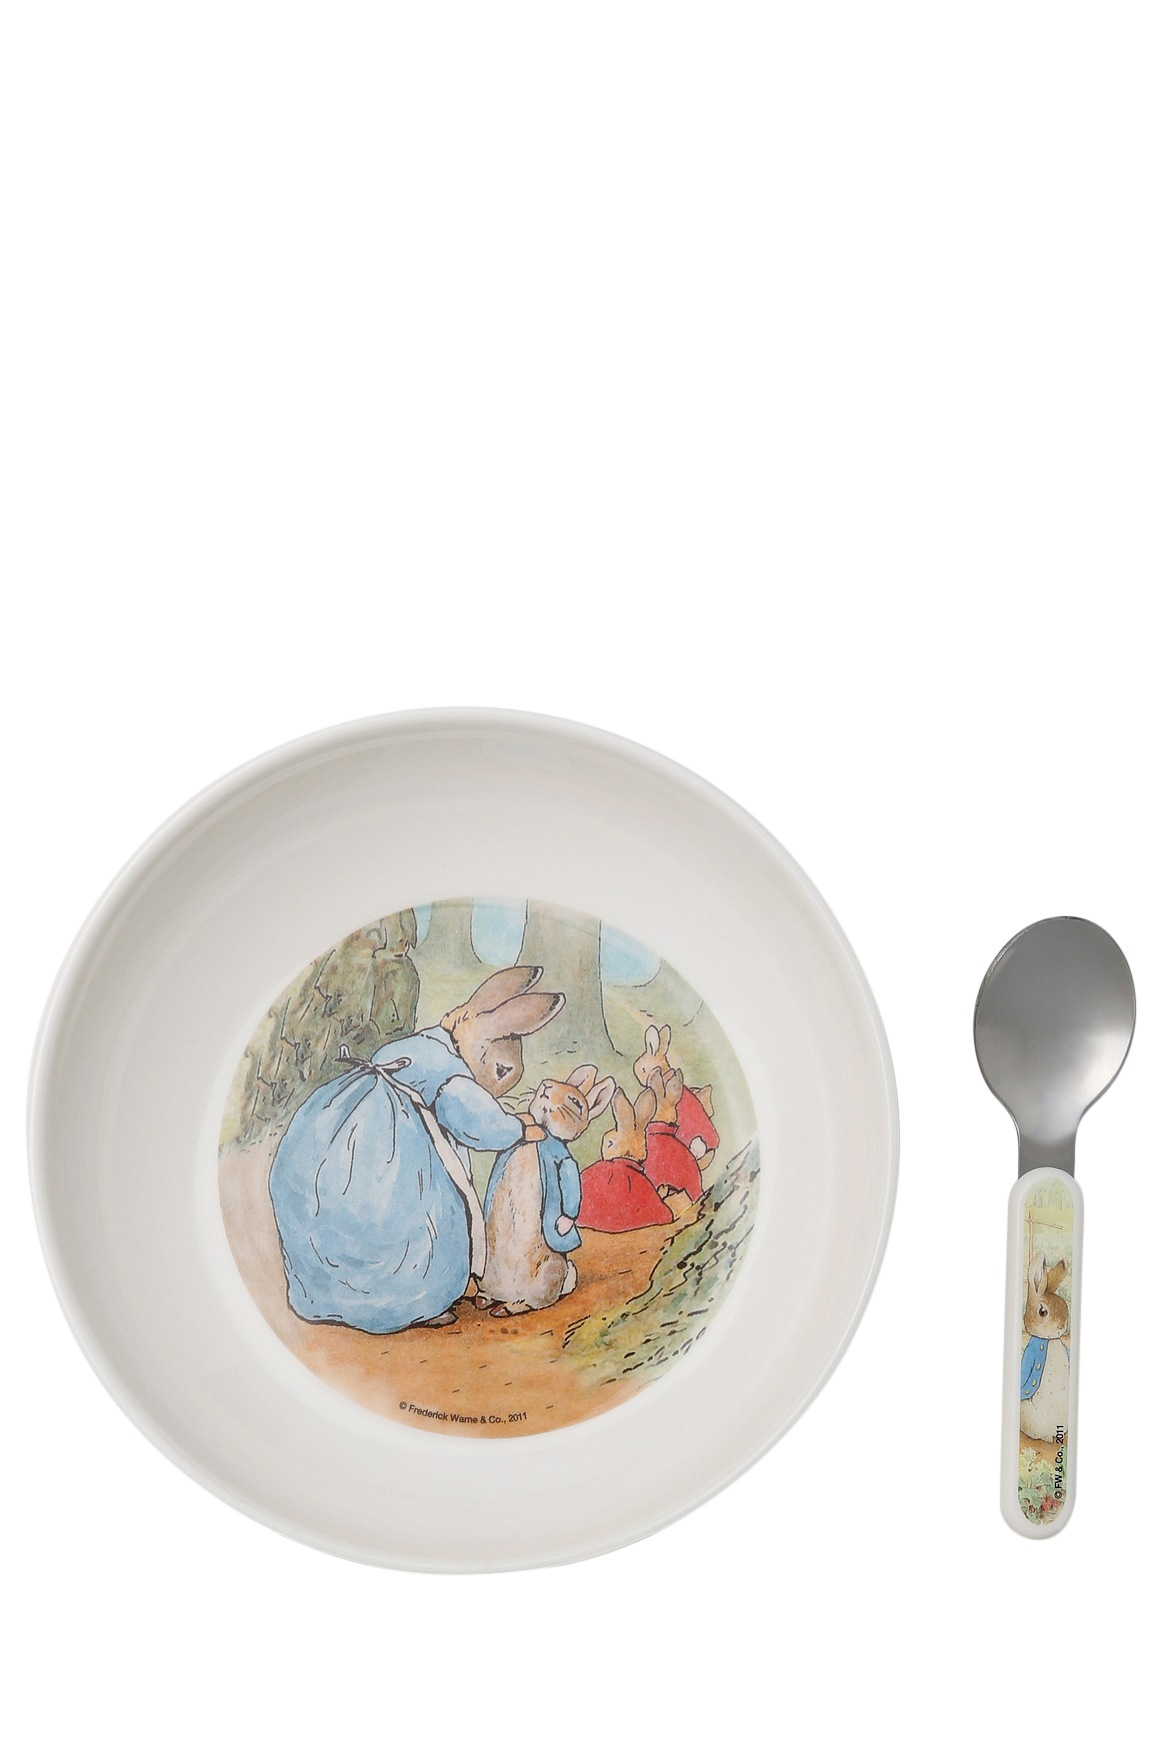 sc 1 st  Myer & Beatrix Potter | Bowl u0026 Spoon Set | Myer Online